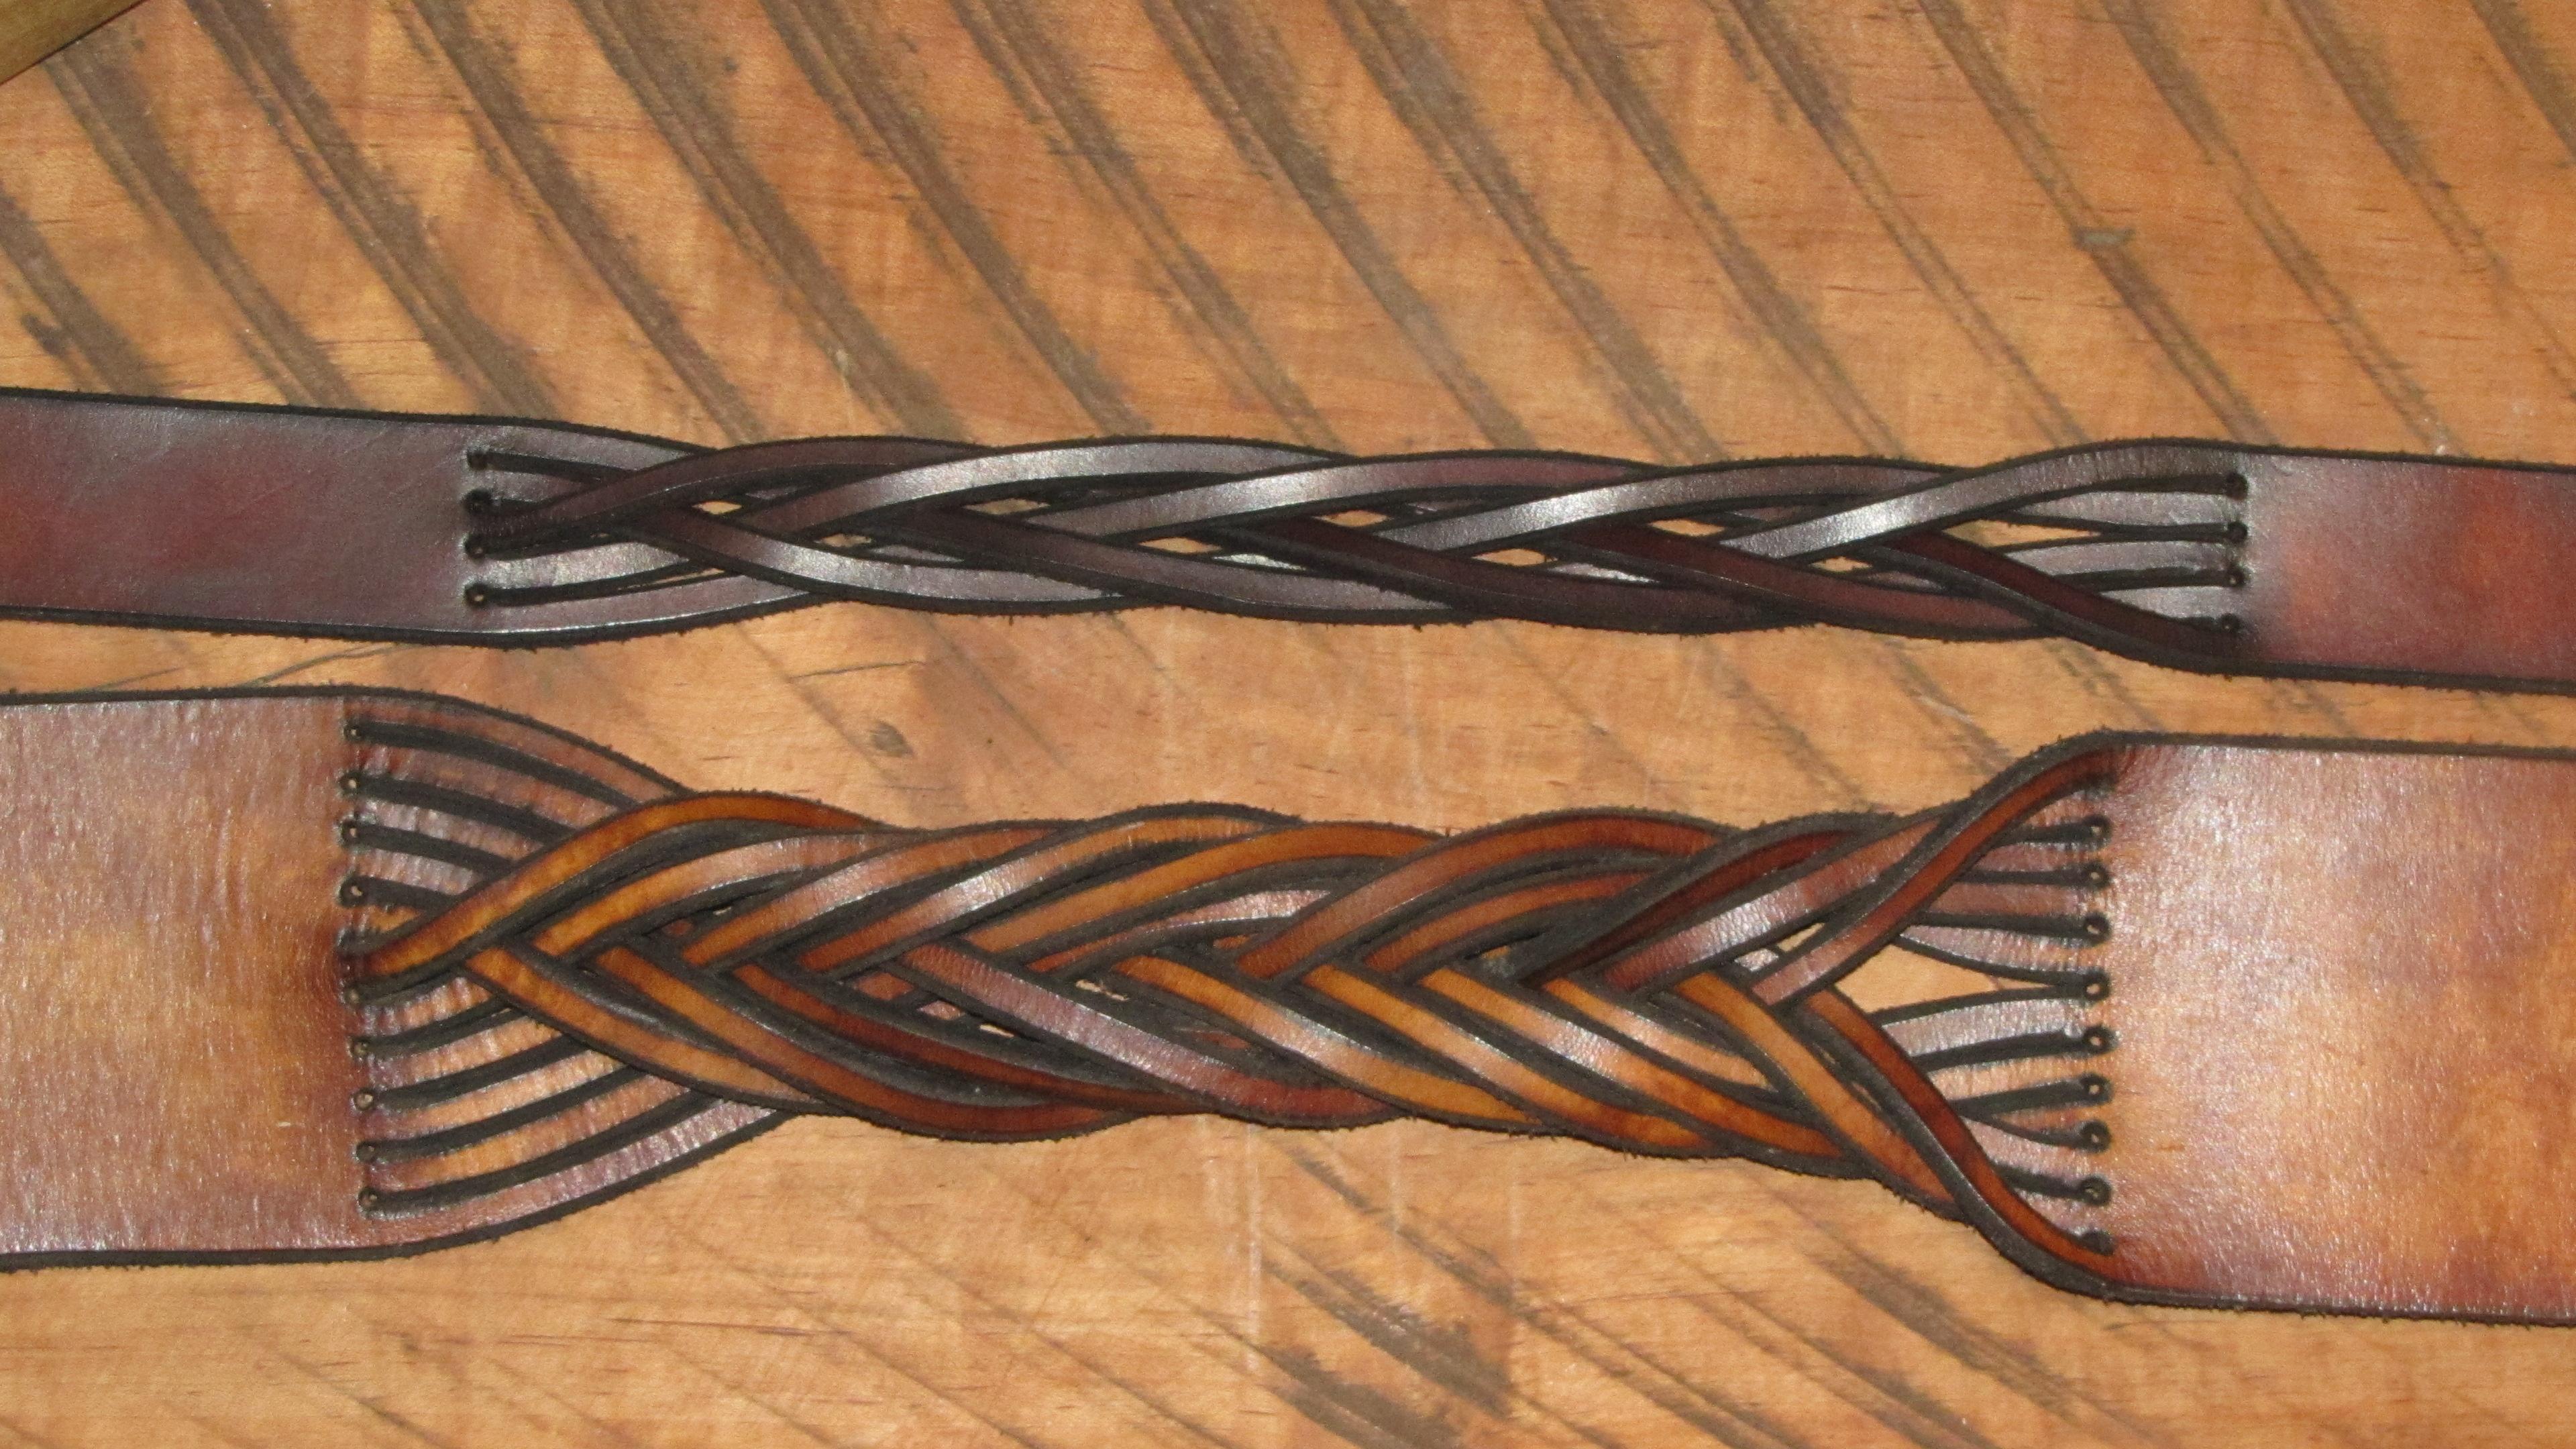 Three Strand Braid or Plait One  How to Tie Knots